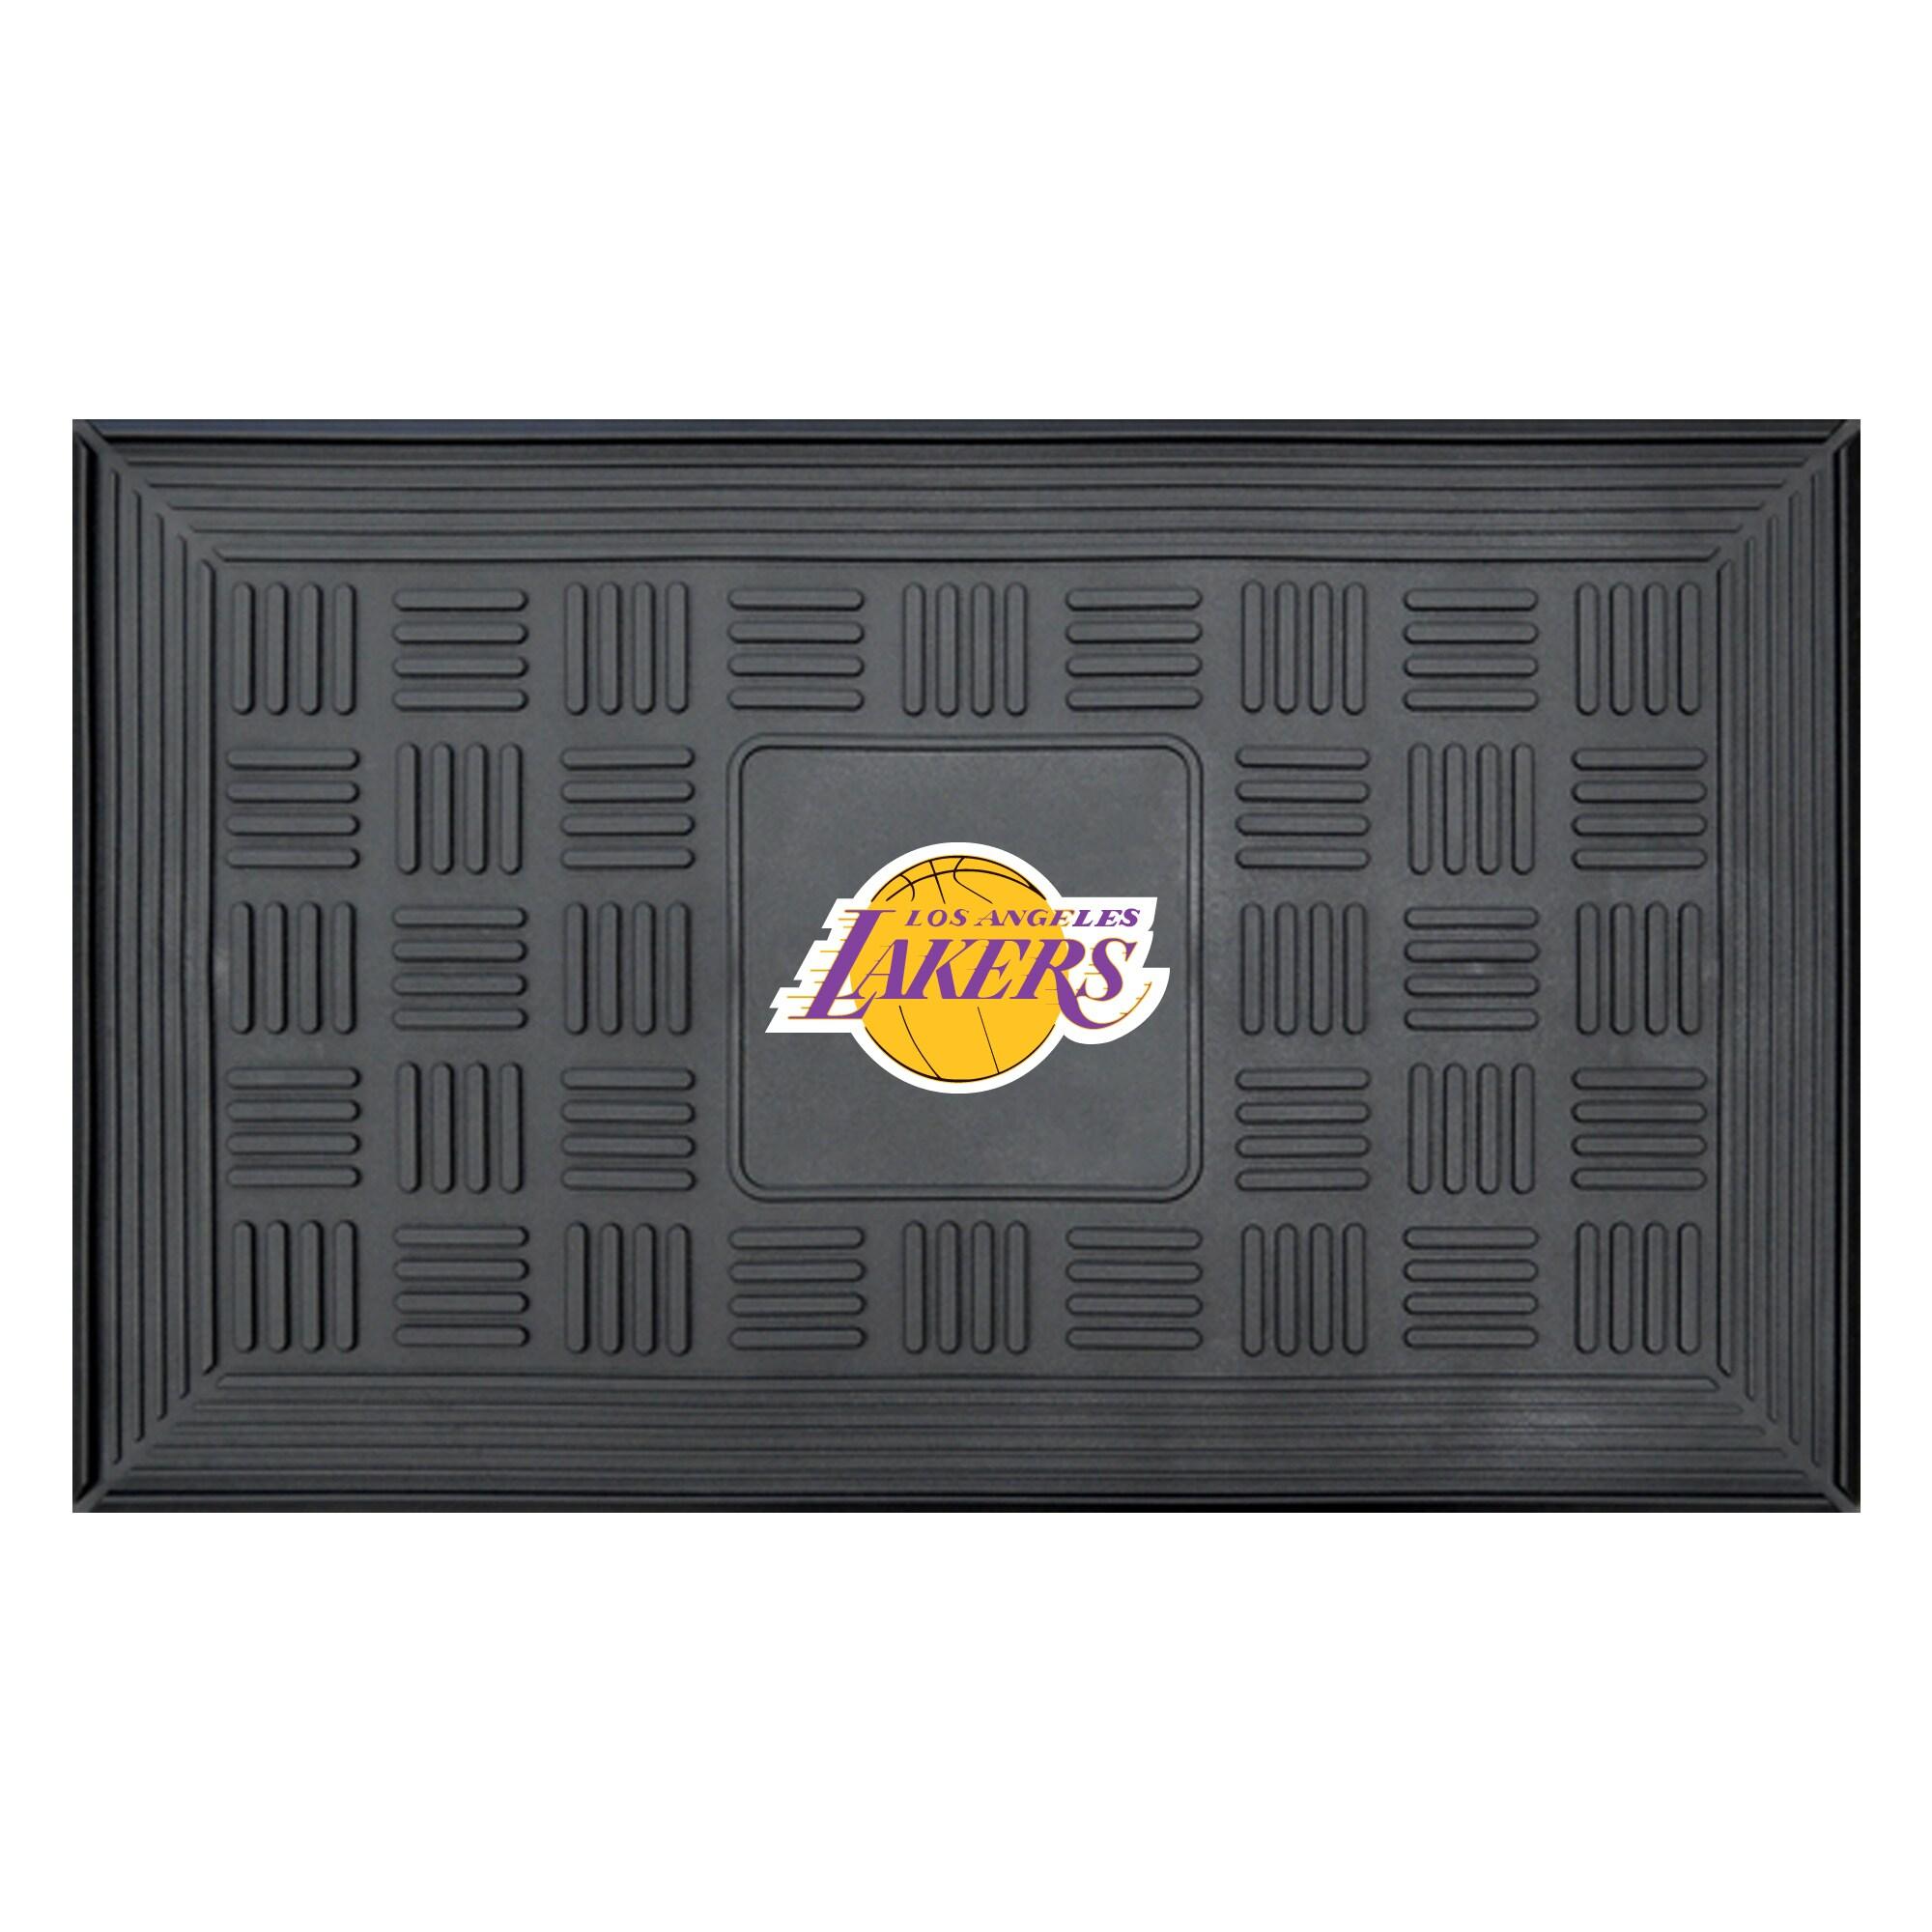 "Los Angeles Lakers 19"" x 30"" Vinyl Medallion Door Mat - Black"